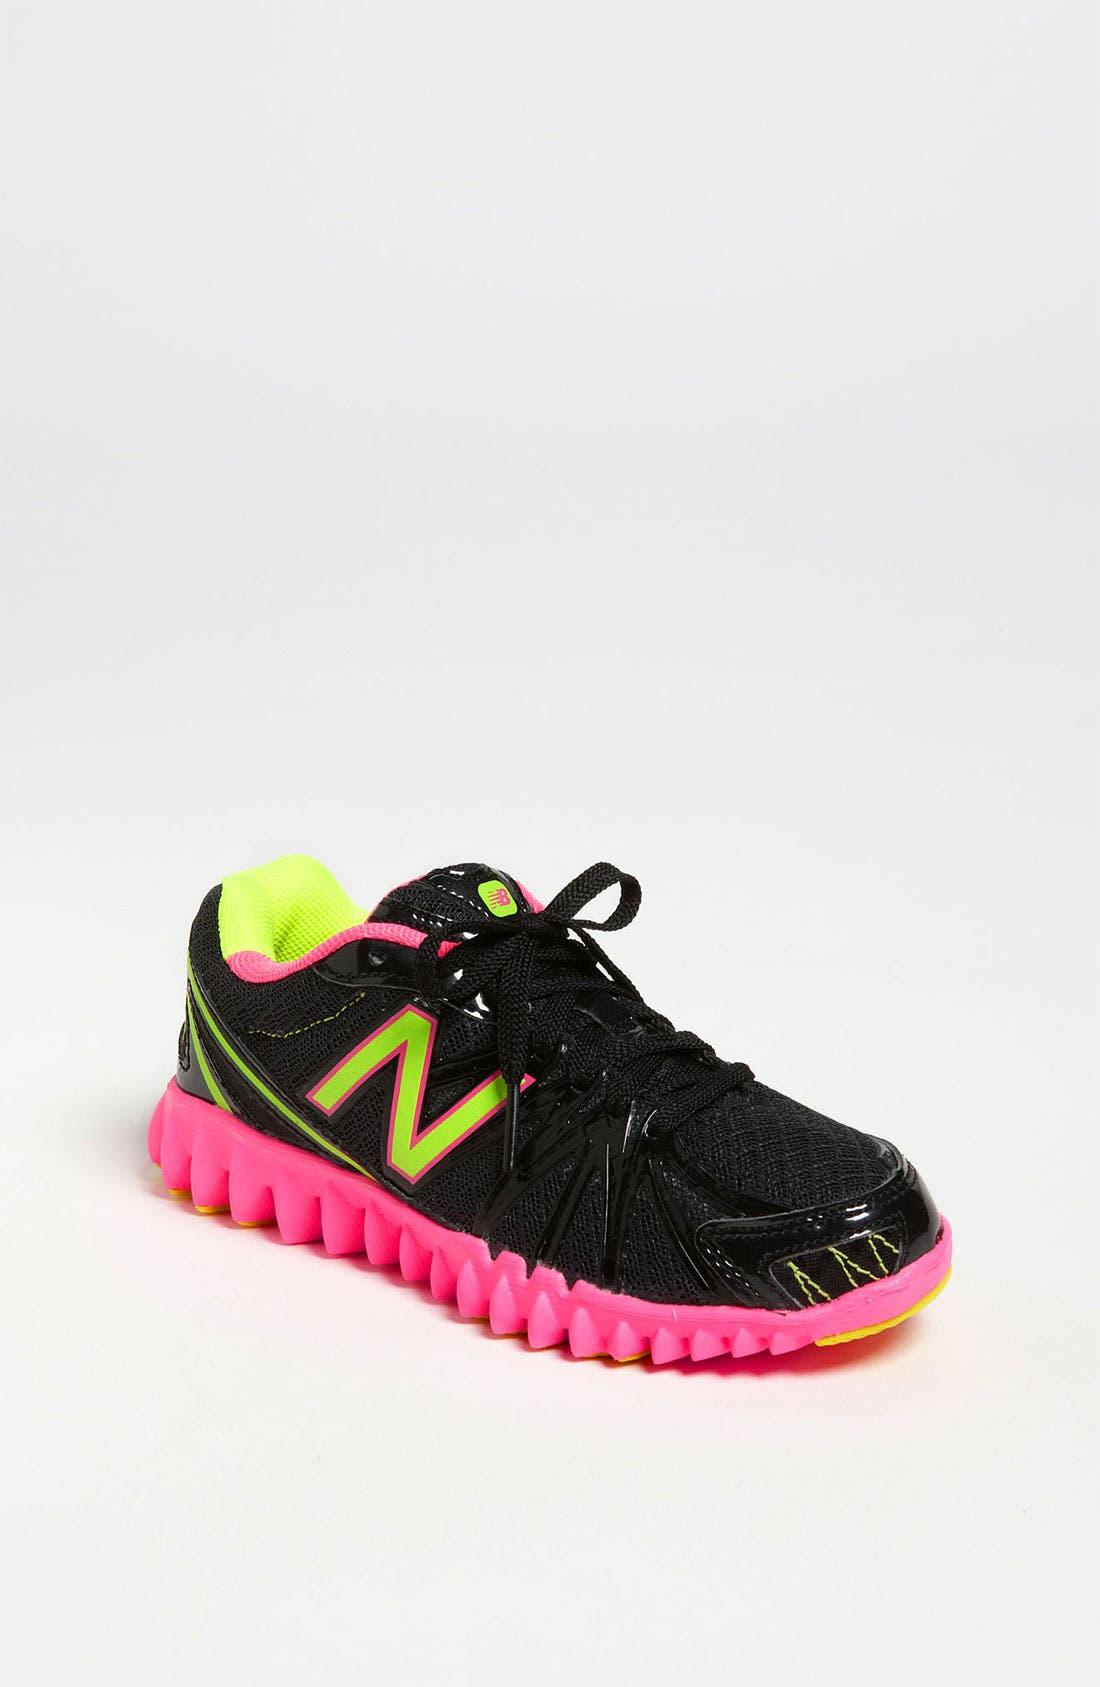 Main Image - New Balance 'Gruve 2750' Running Shoe (Toddler, Little Kid & Big Kid)